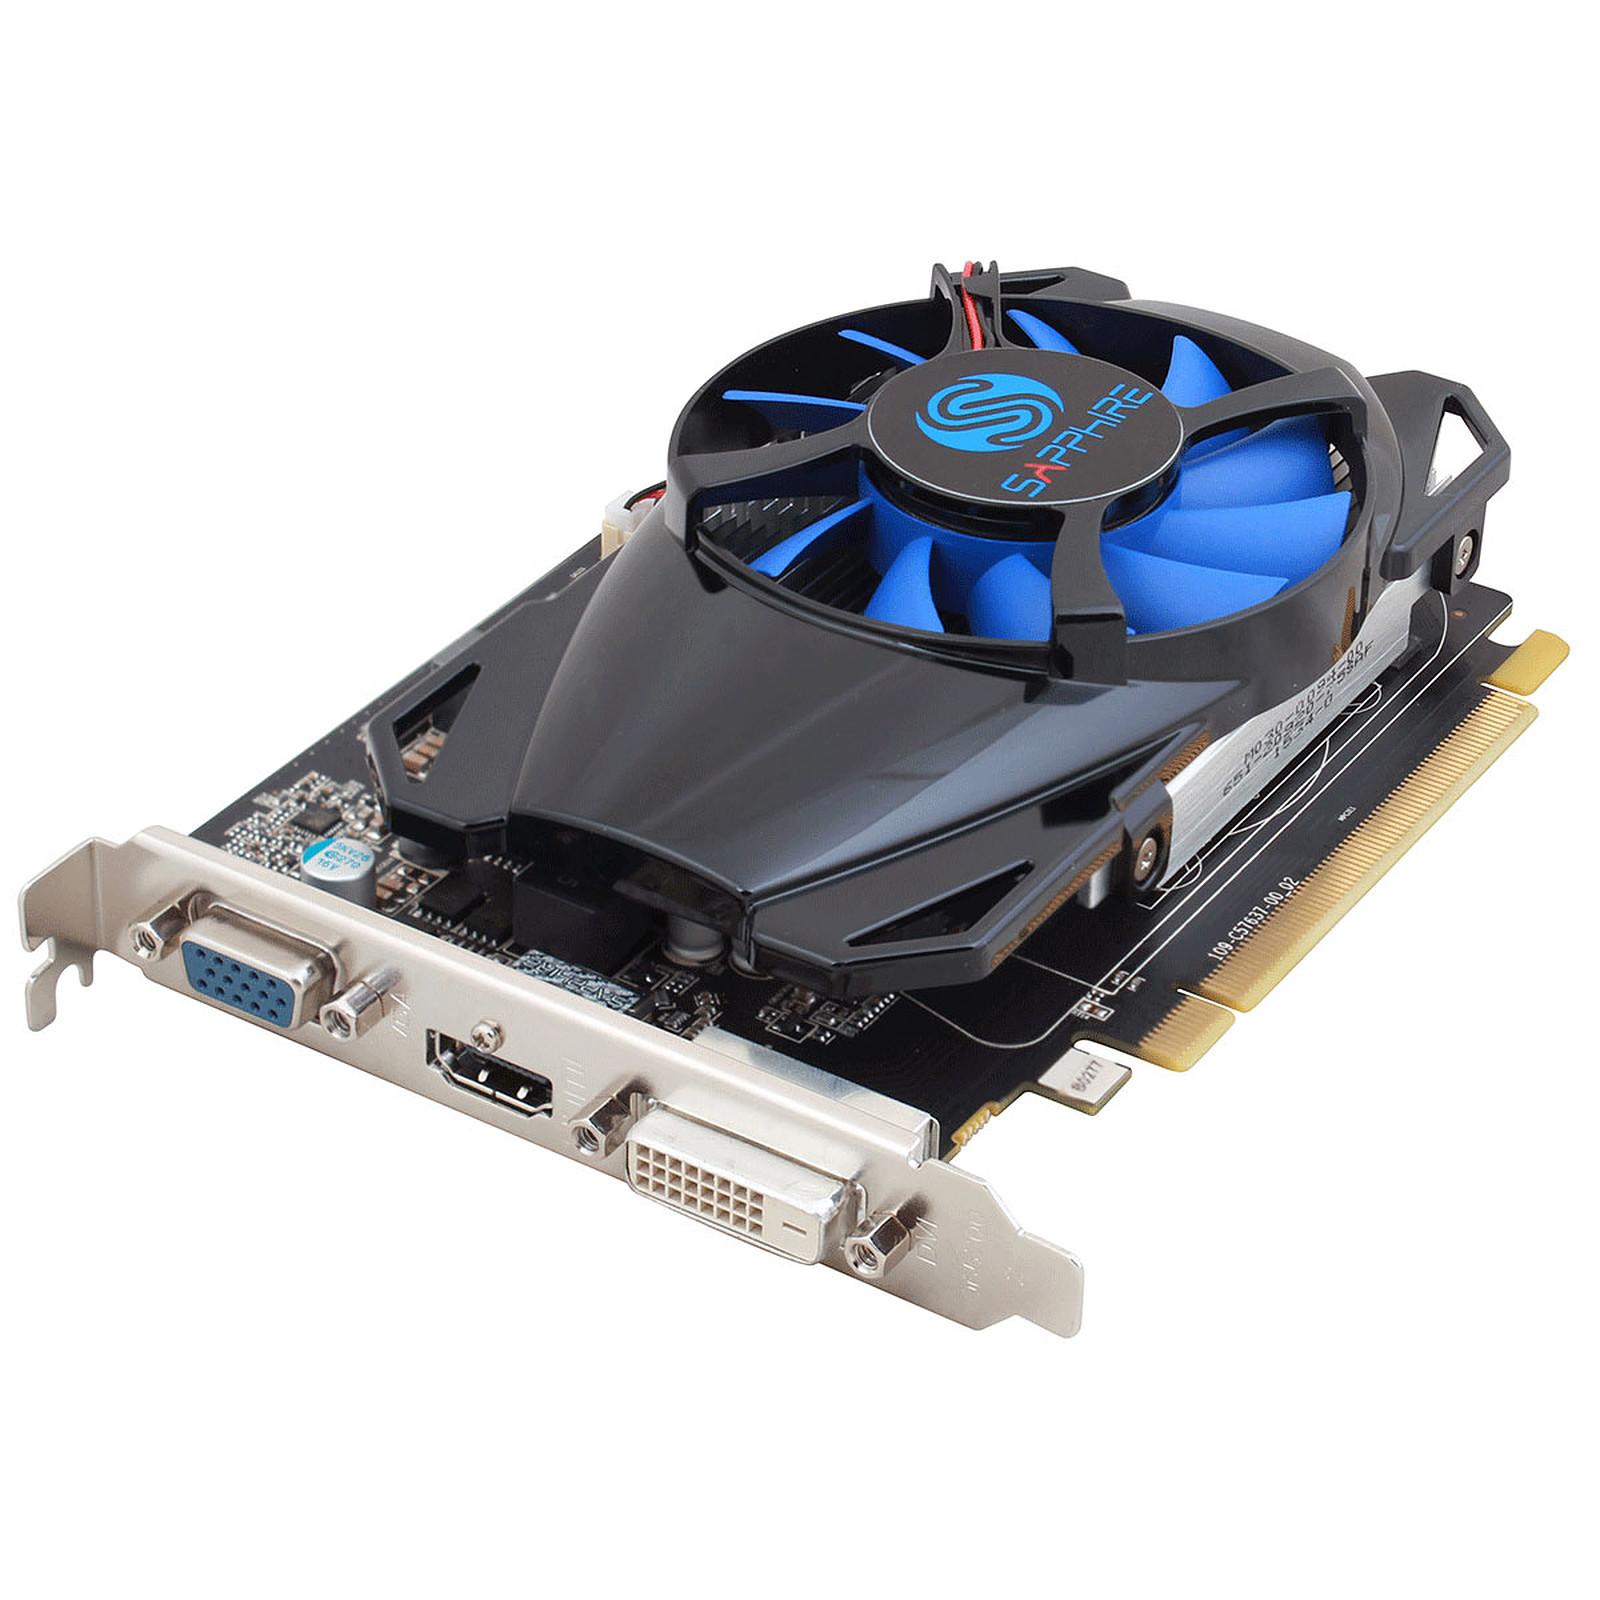 Sapphire Radeon R7 250 2G GDDR5 (bulk)